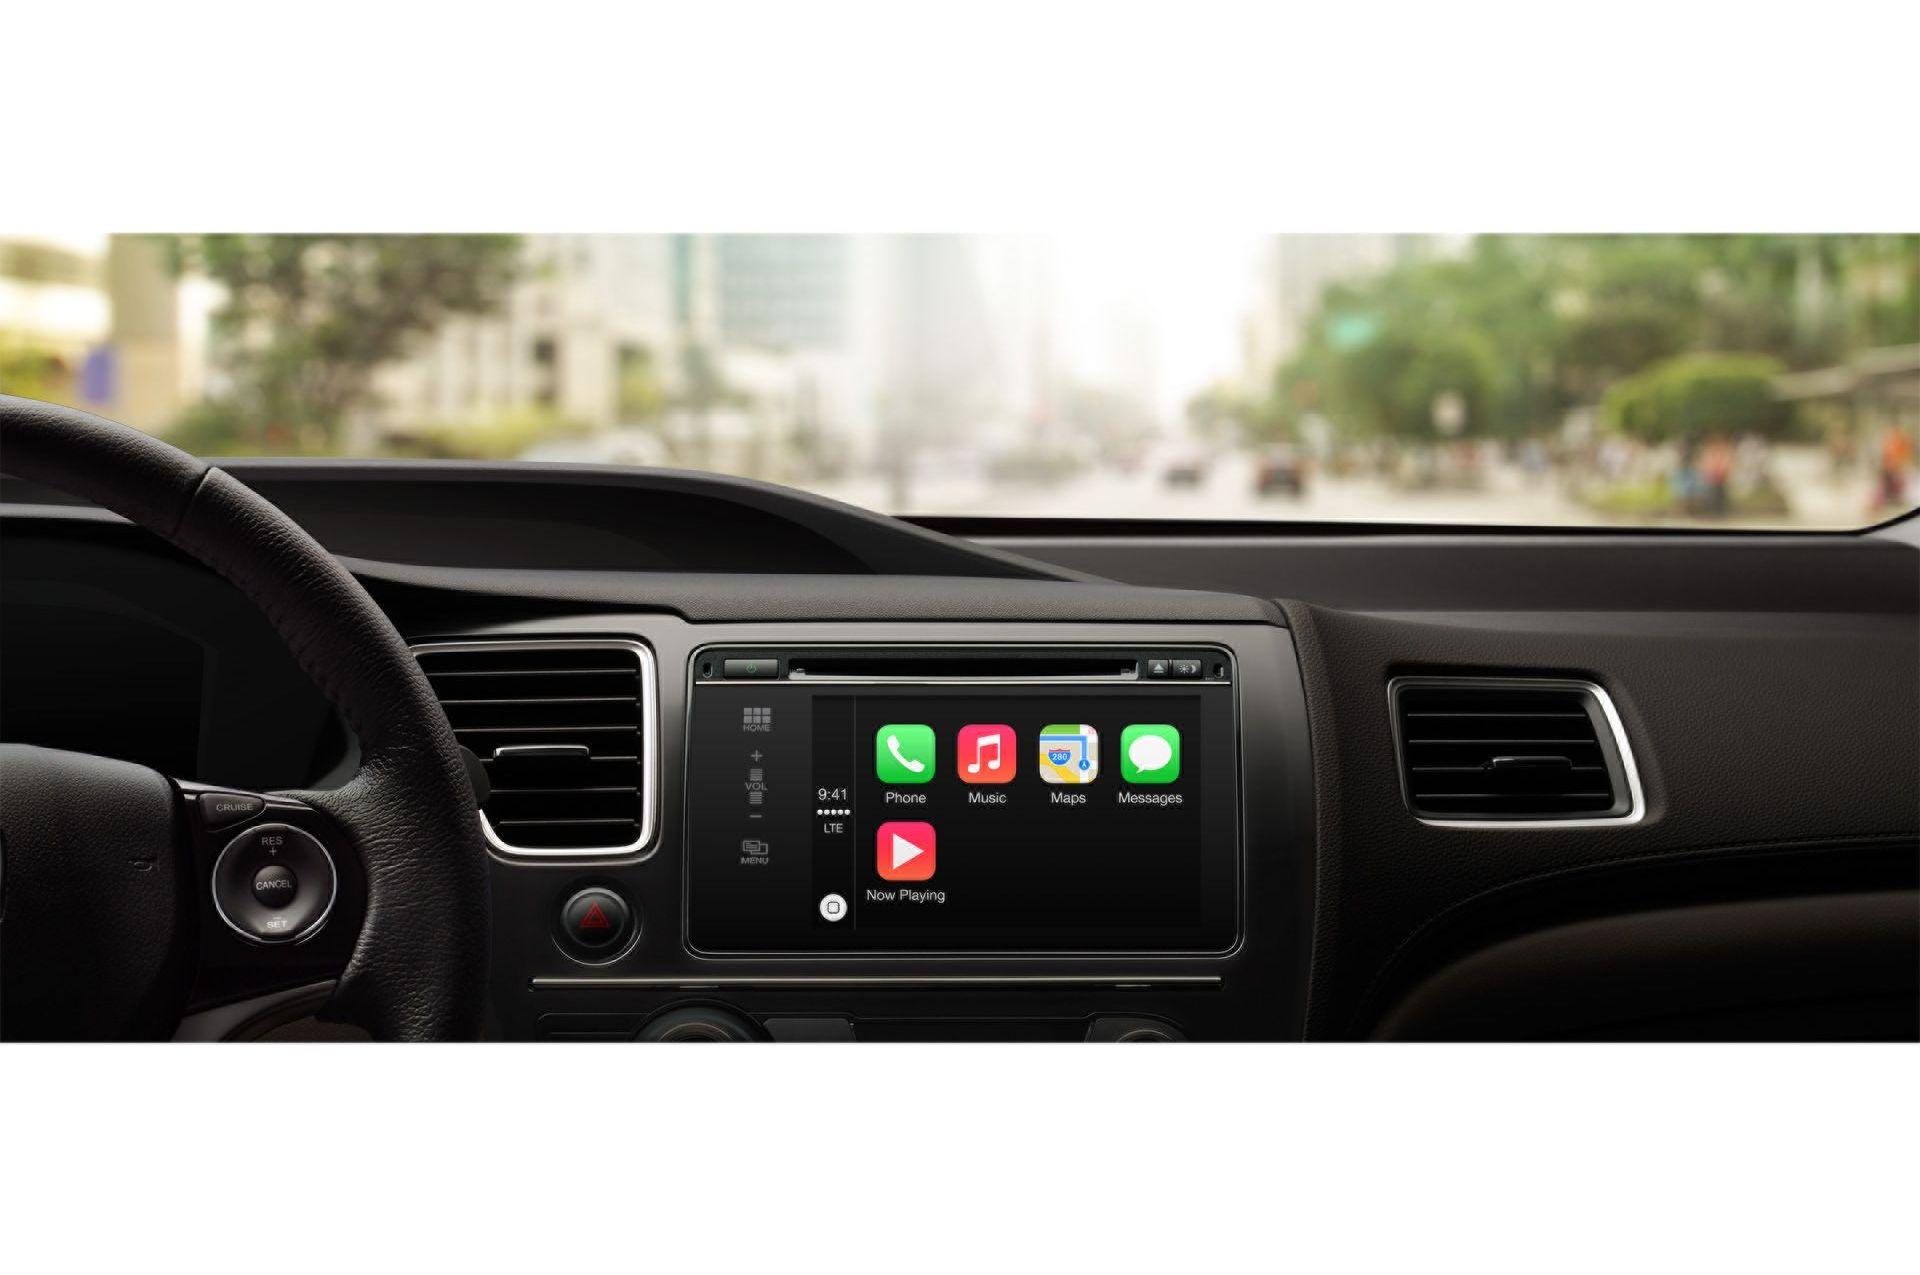 CarPlay finally welcomes navigation apps Waze and Google